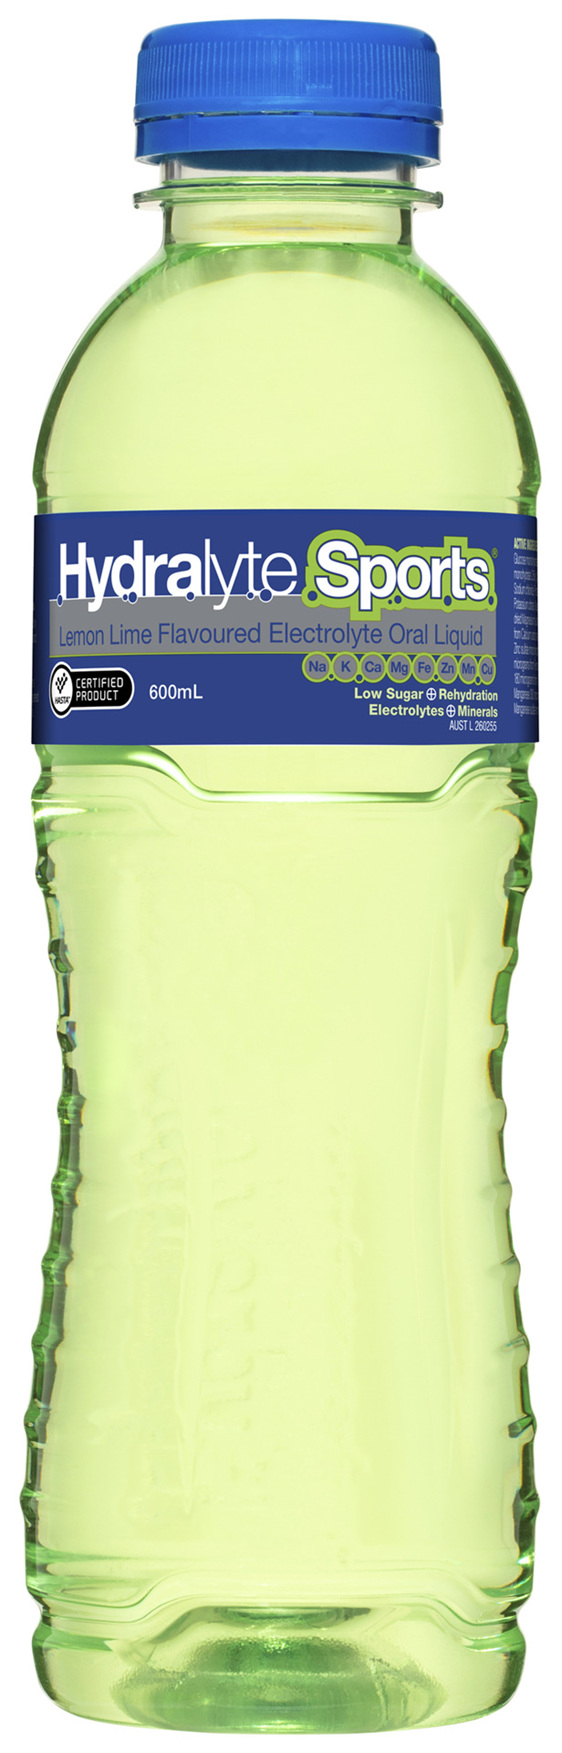 Hydralyte Sports Electrolyte Oral Liquid Lemon Lime 600mL